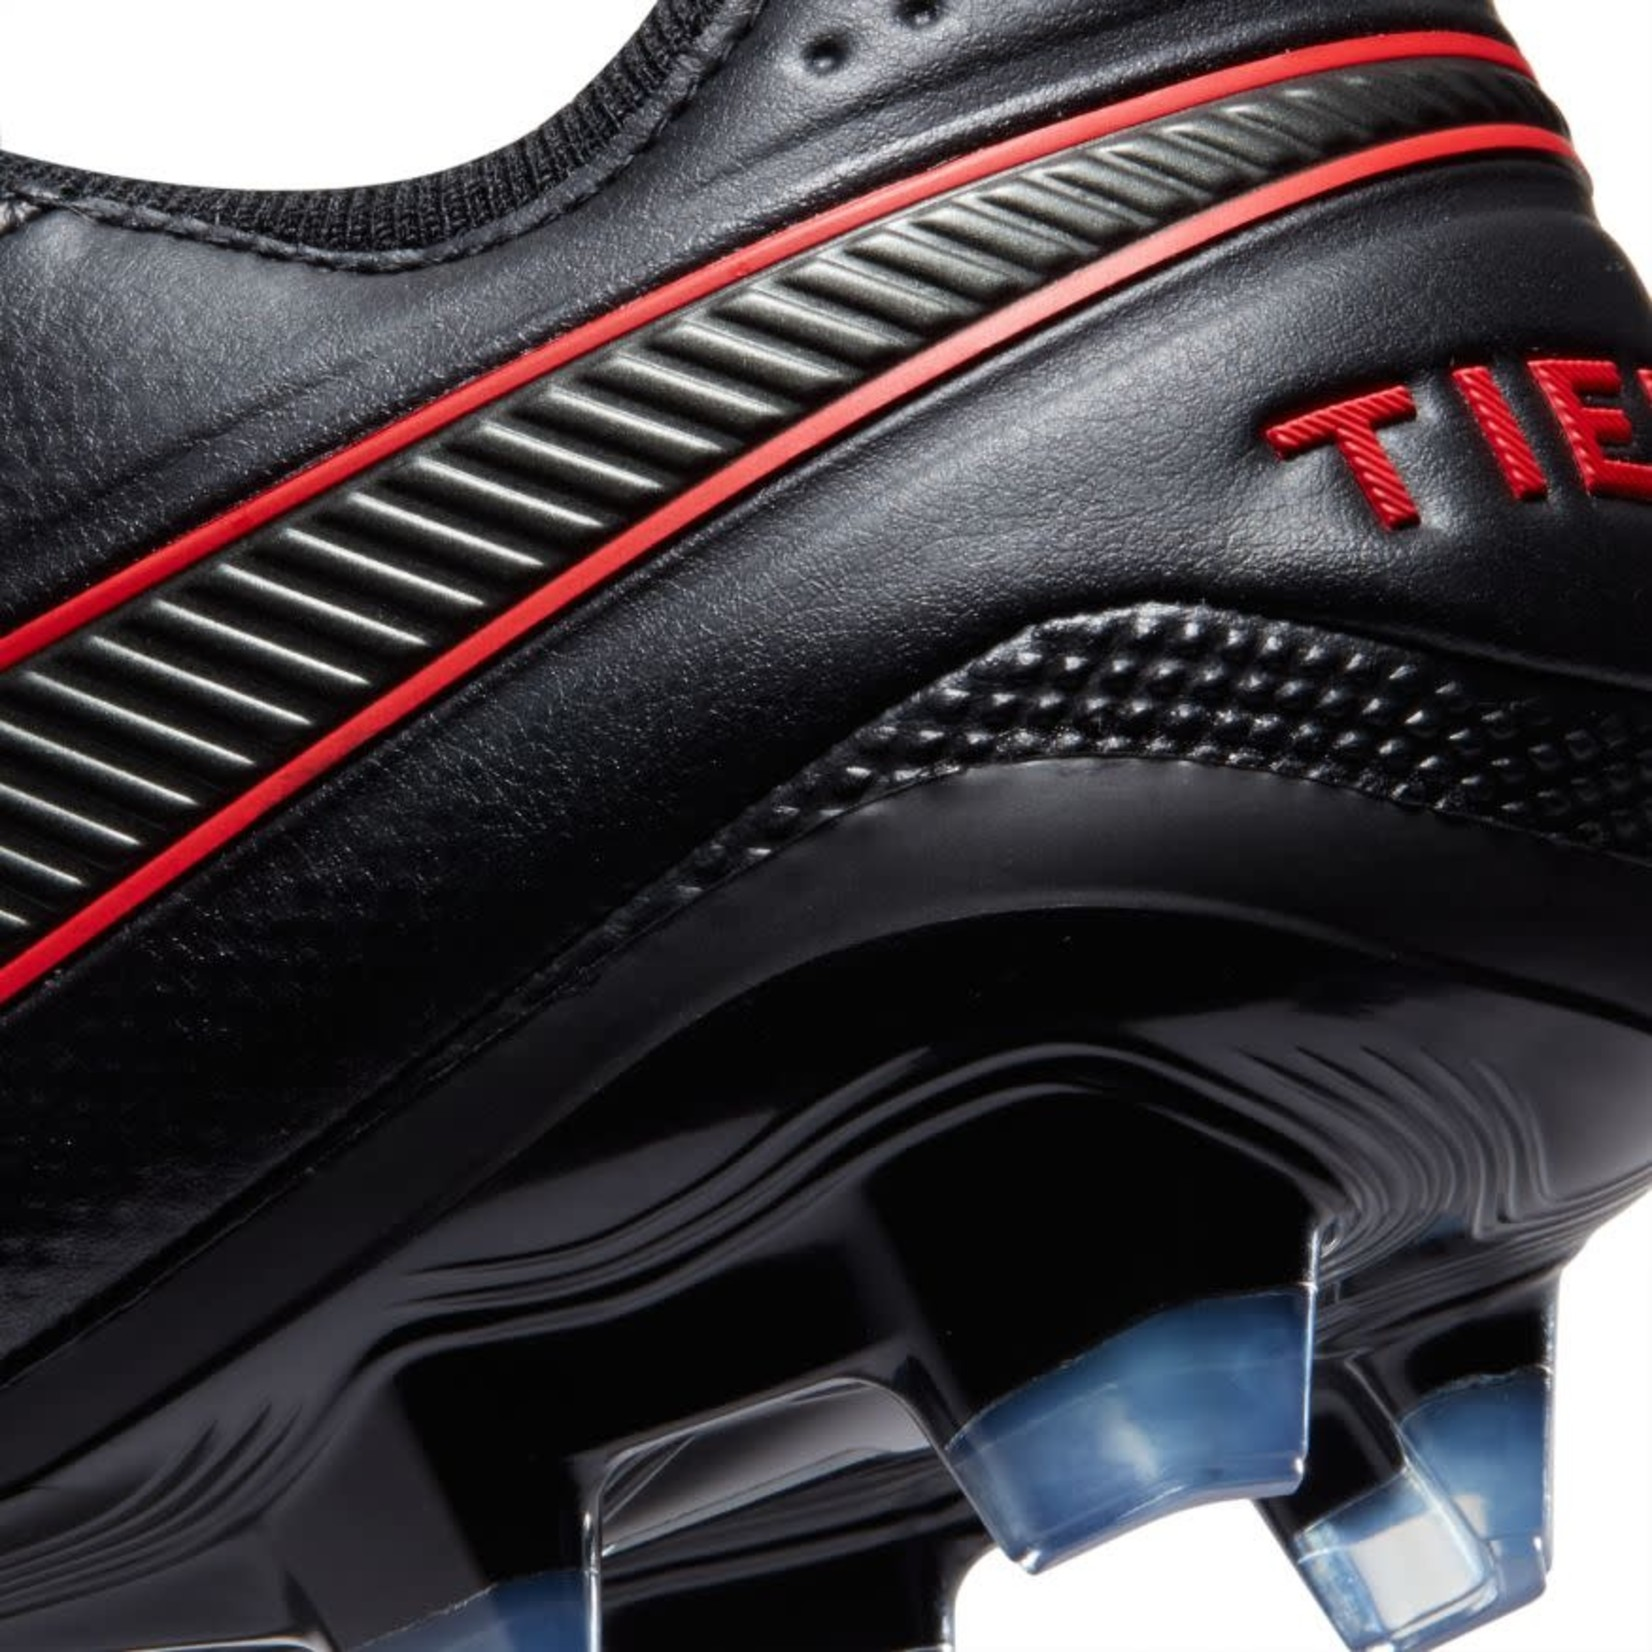 NIKE TIEMPO LEGEND 8 ELITE FG (BLACK/RED)